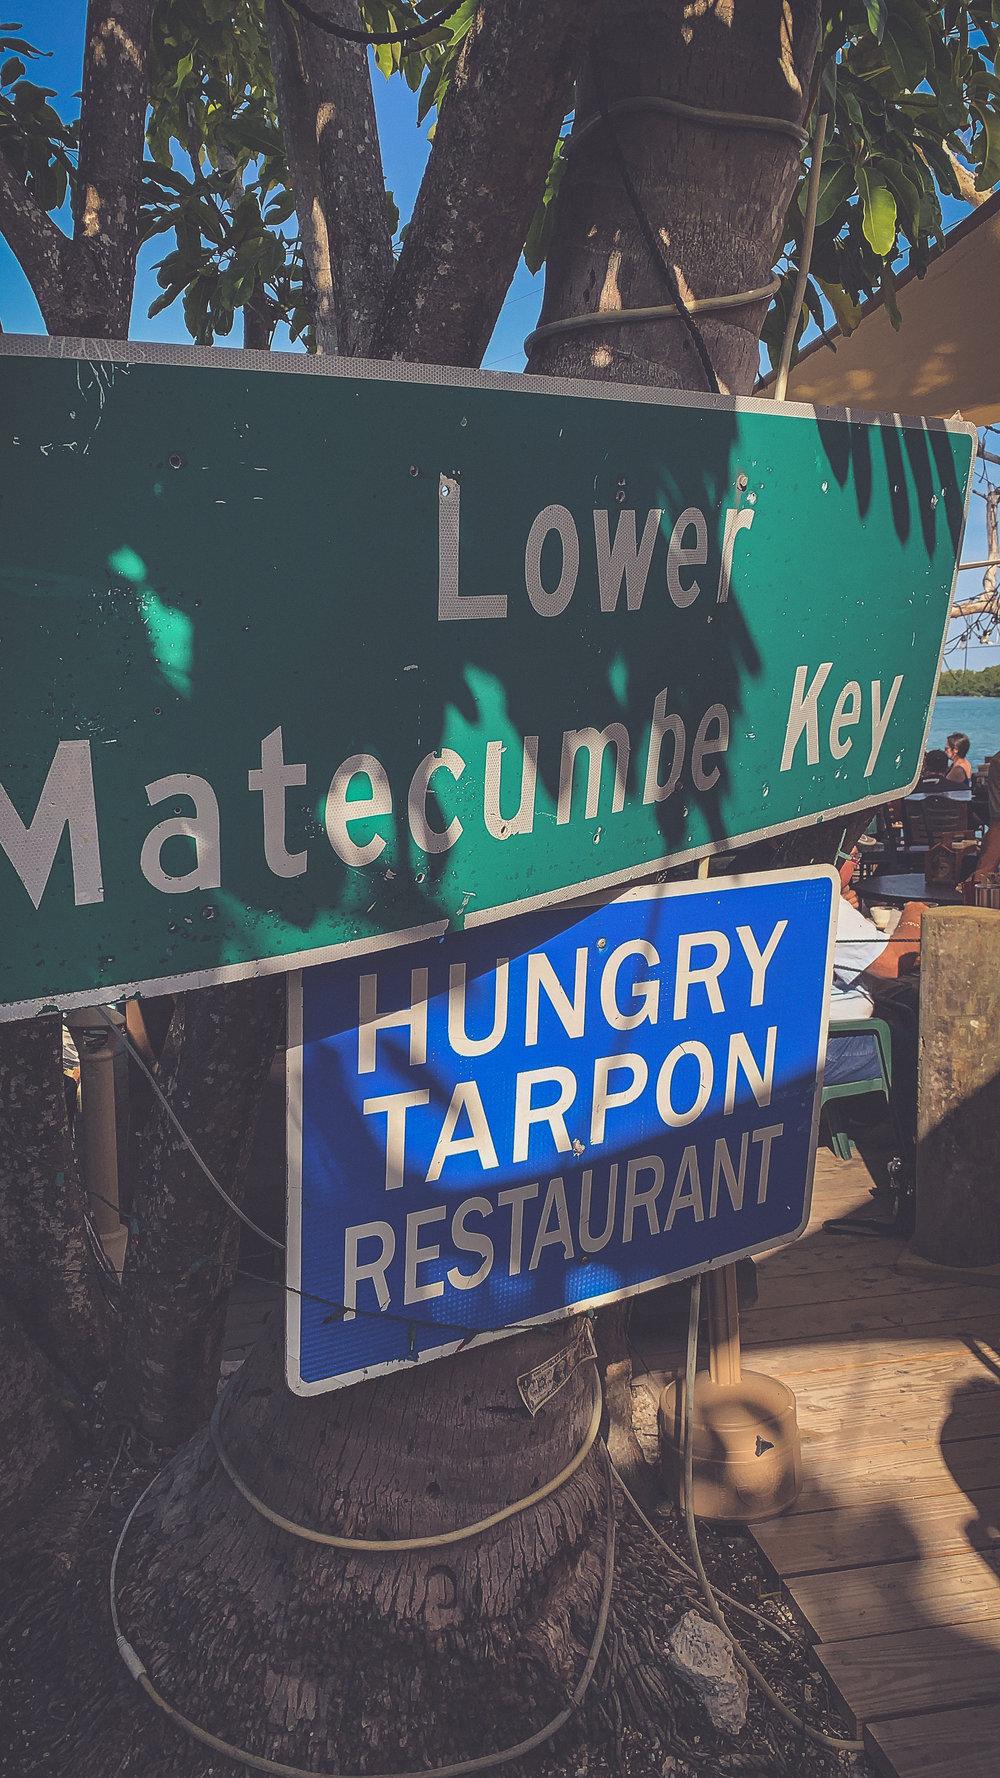 The Hungry Tarpon